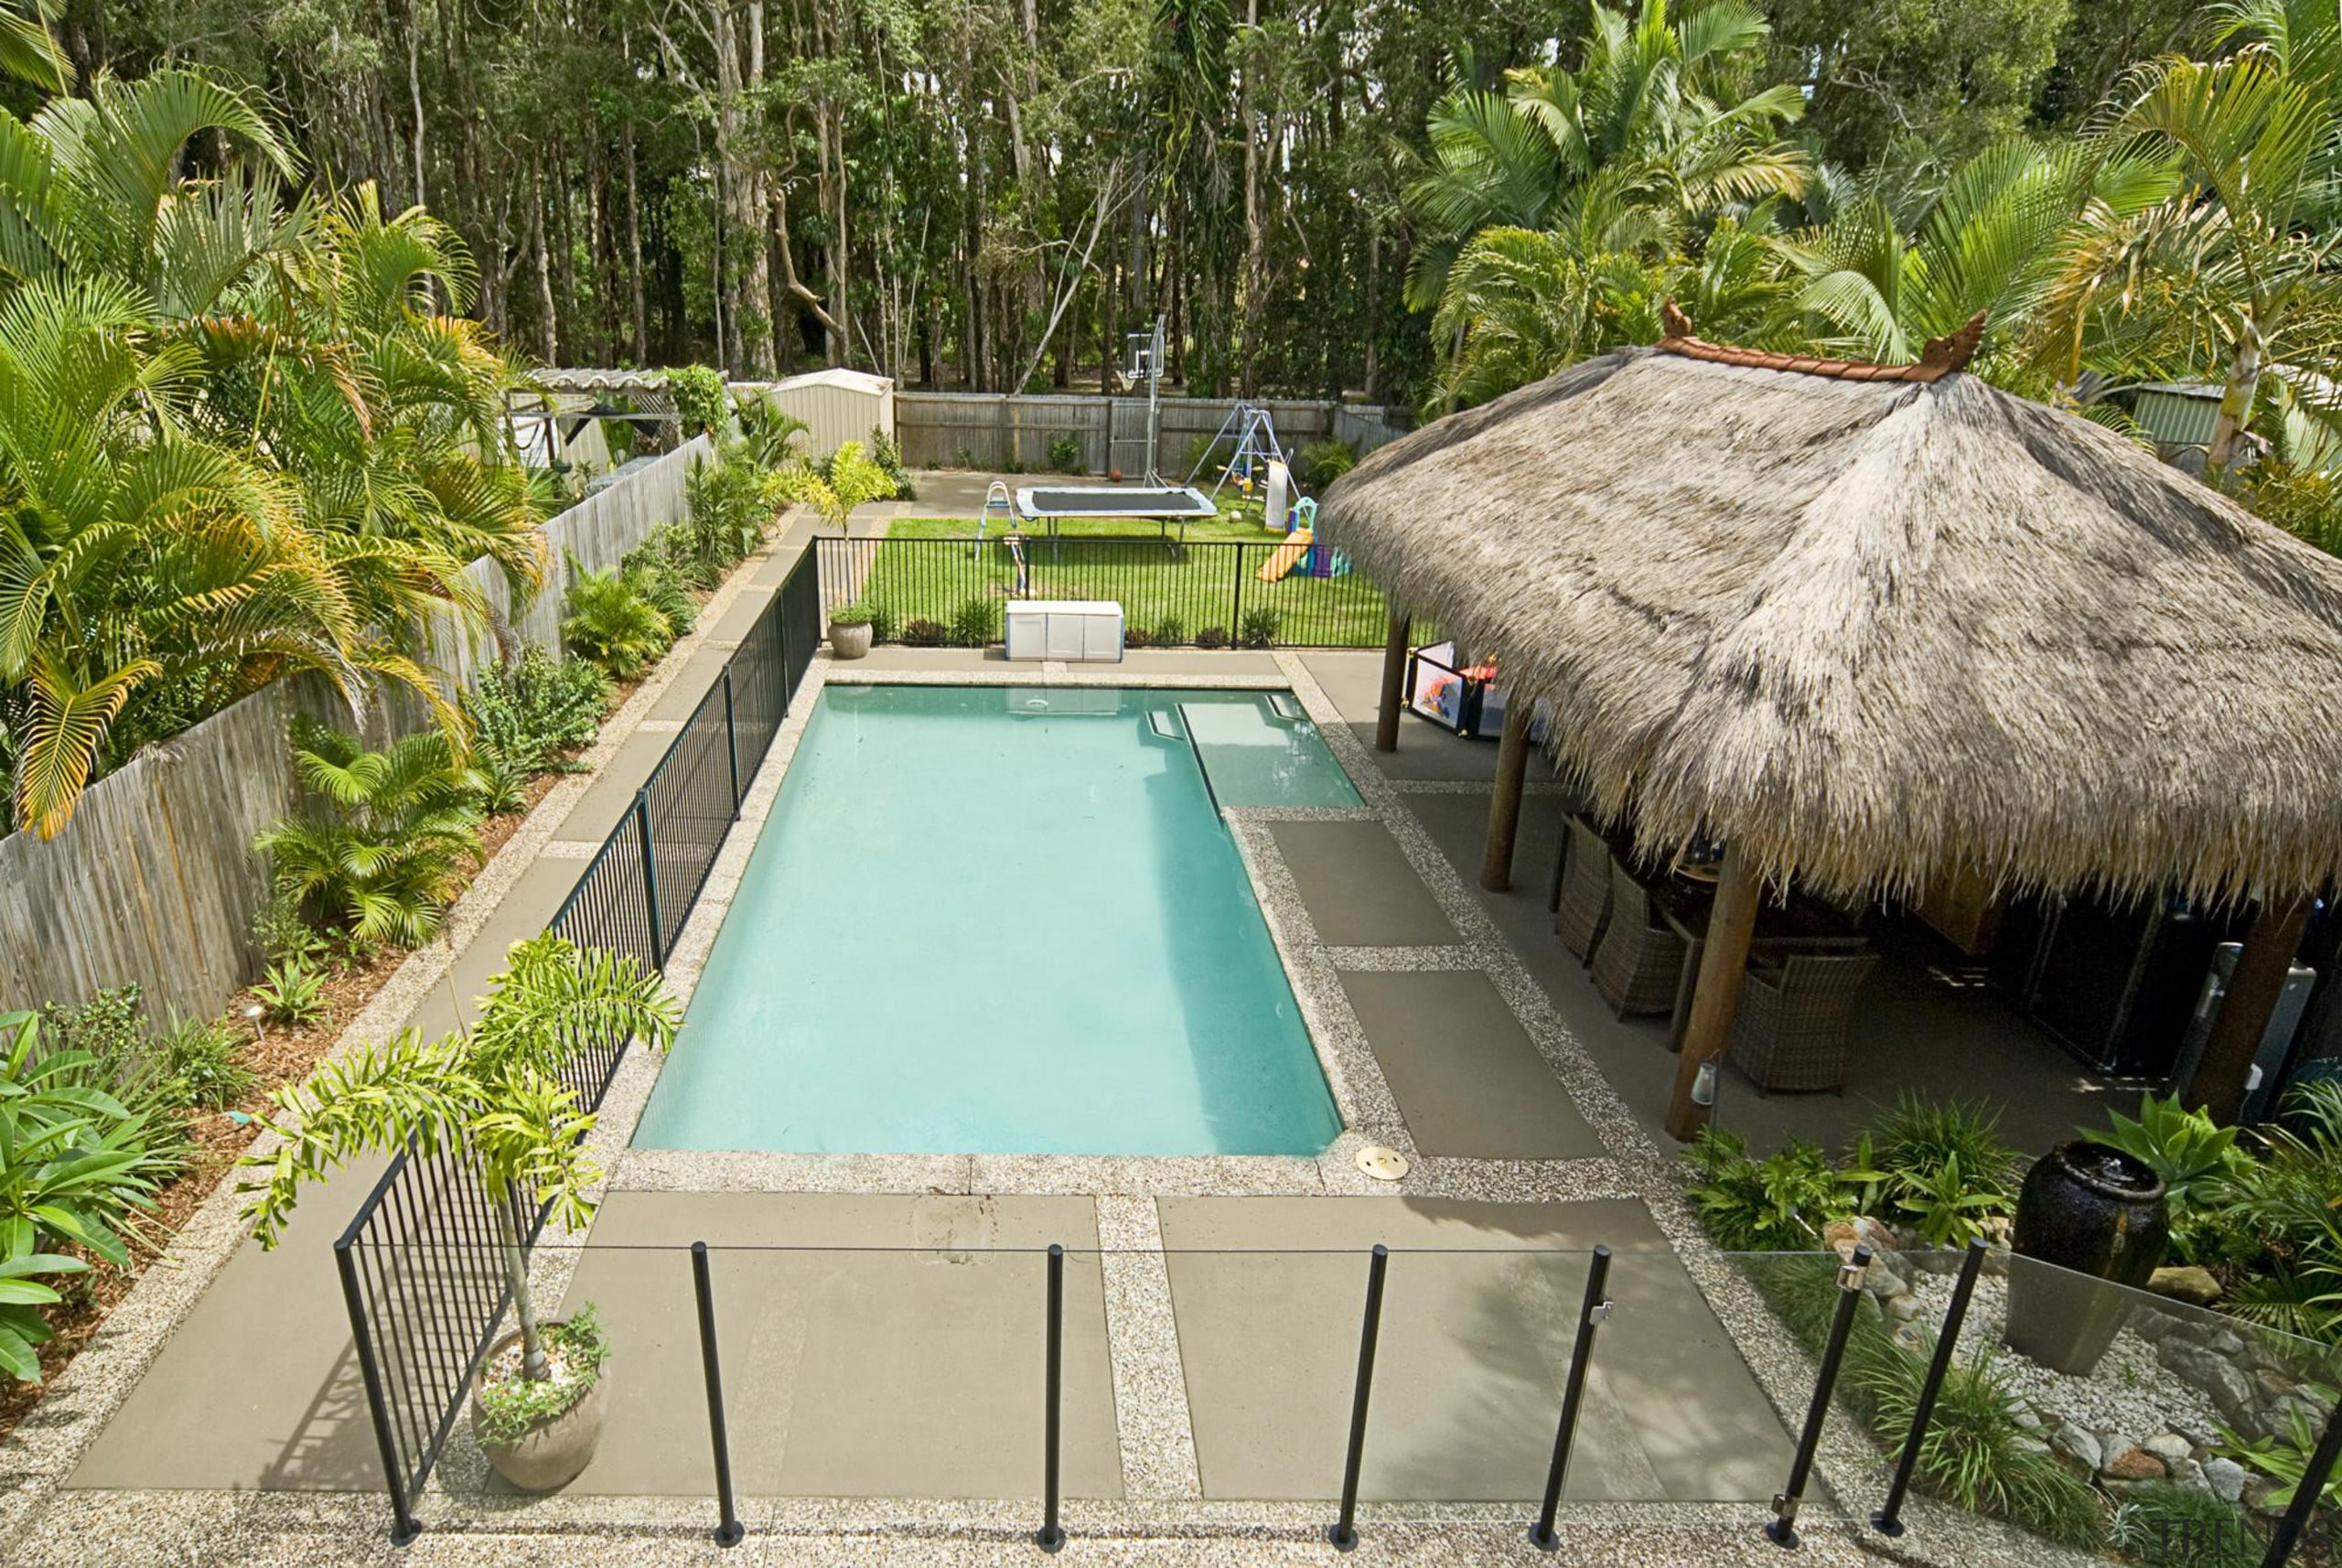 Colourmix 42 - Colourmix_42 - arecales   estate arecales, estate, leisure, property, real estate, resort, swimming pool, brown